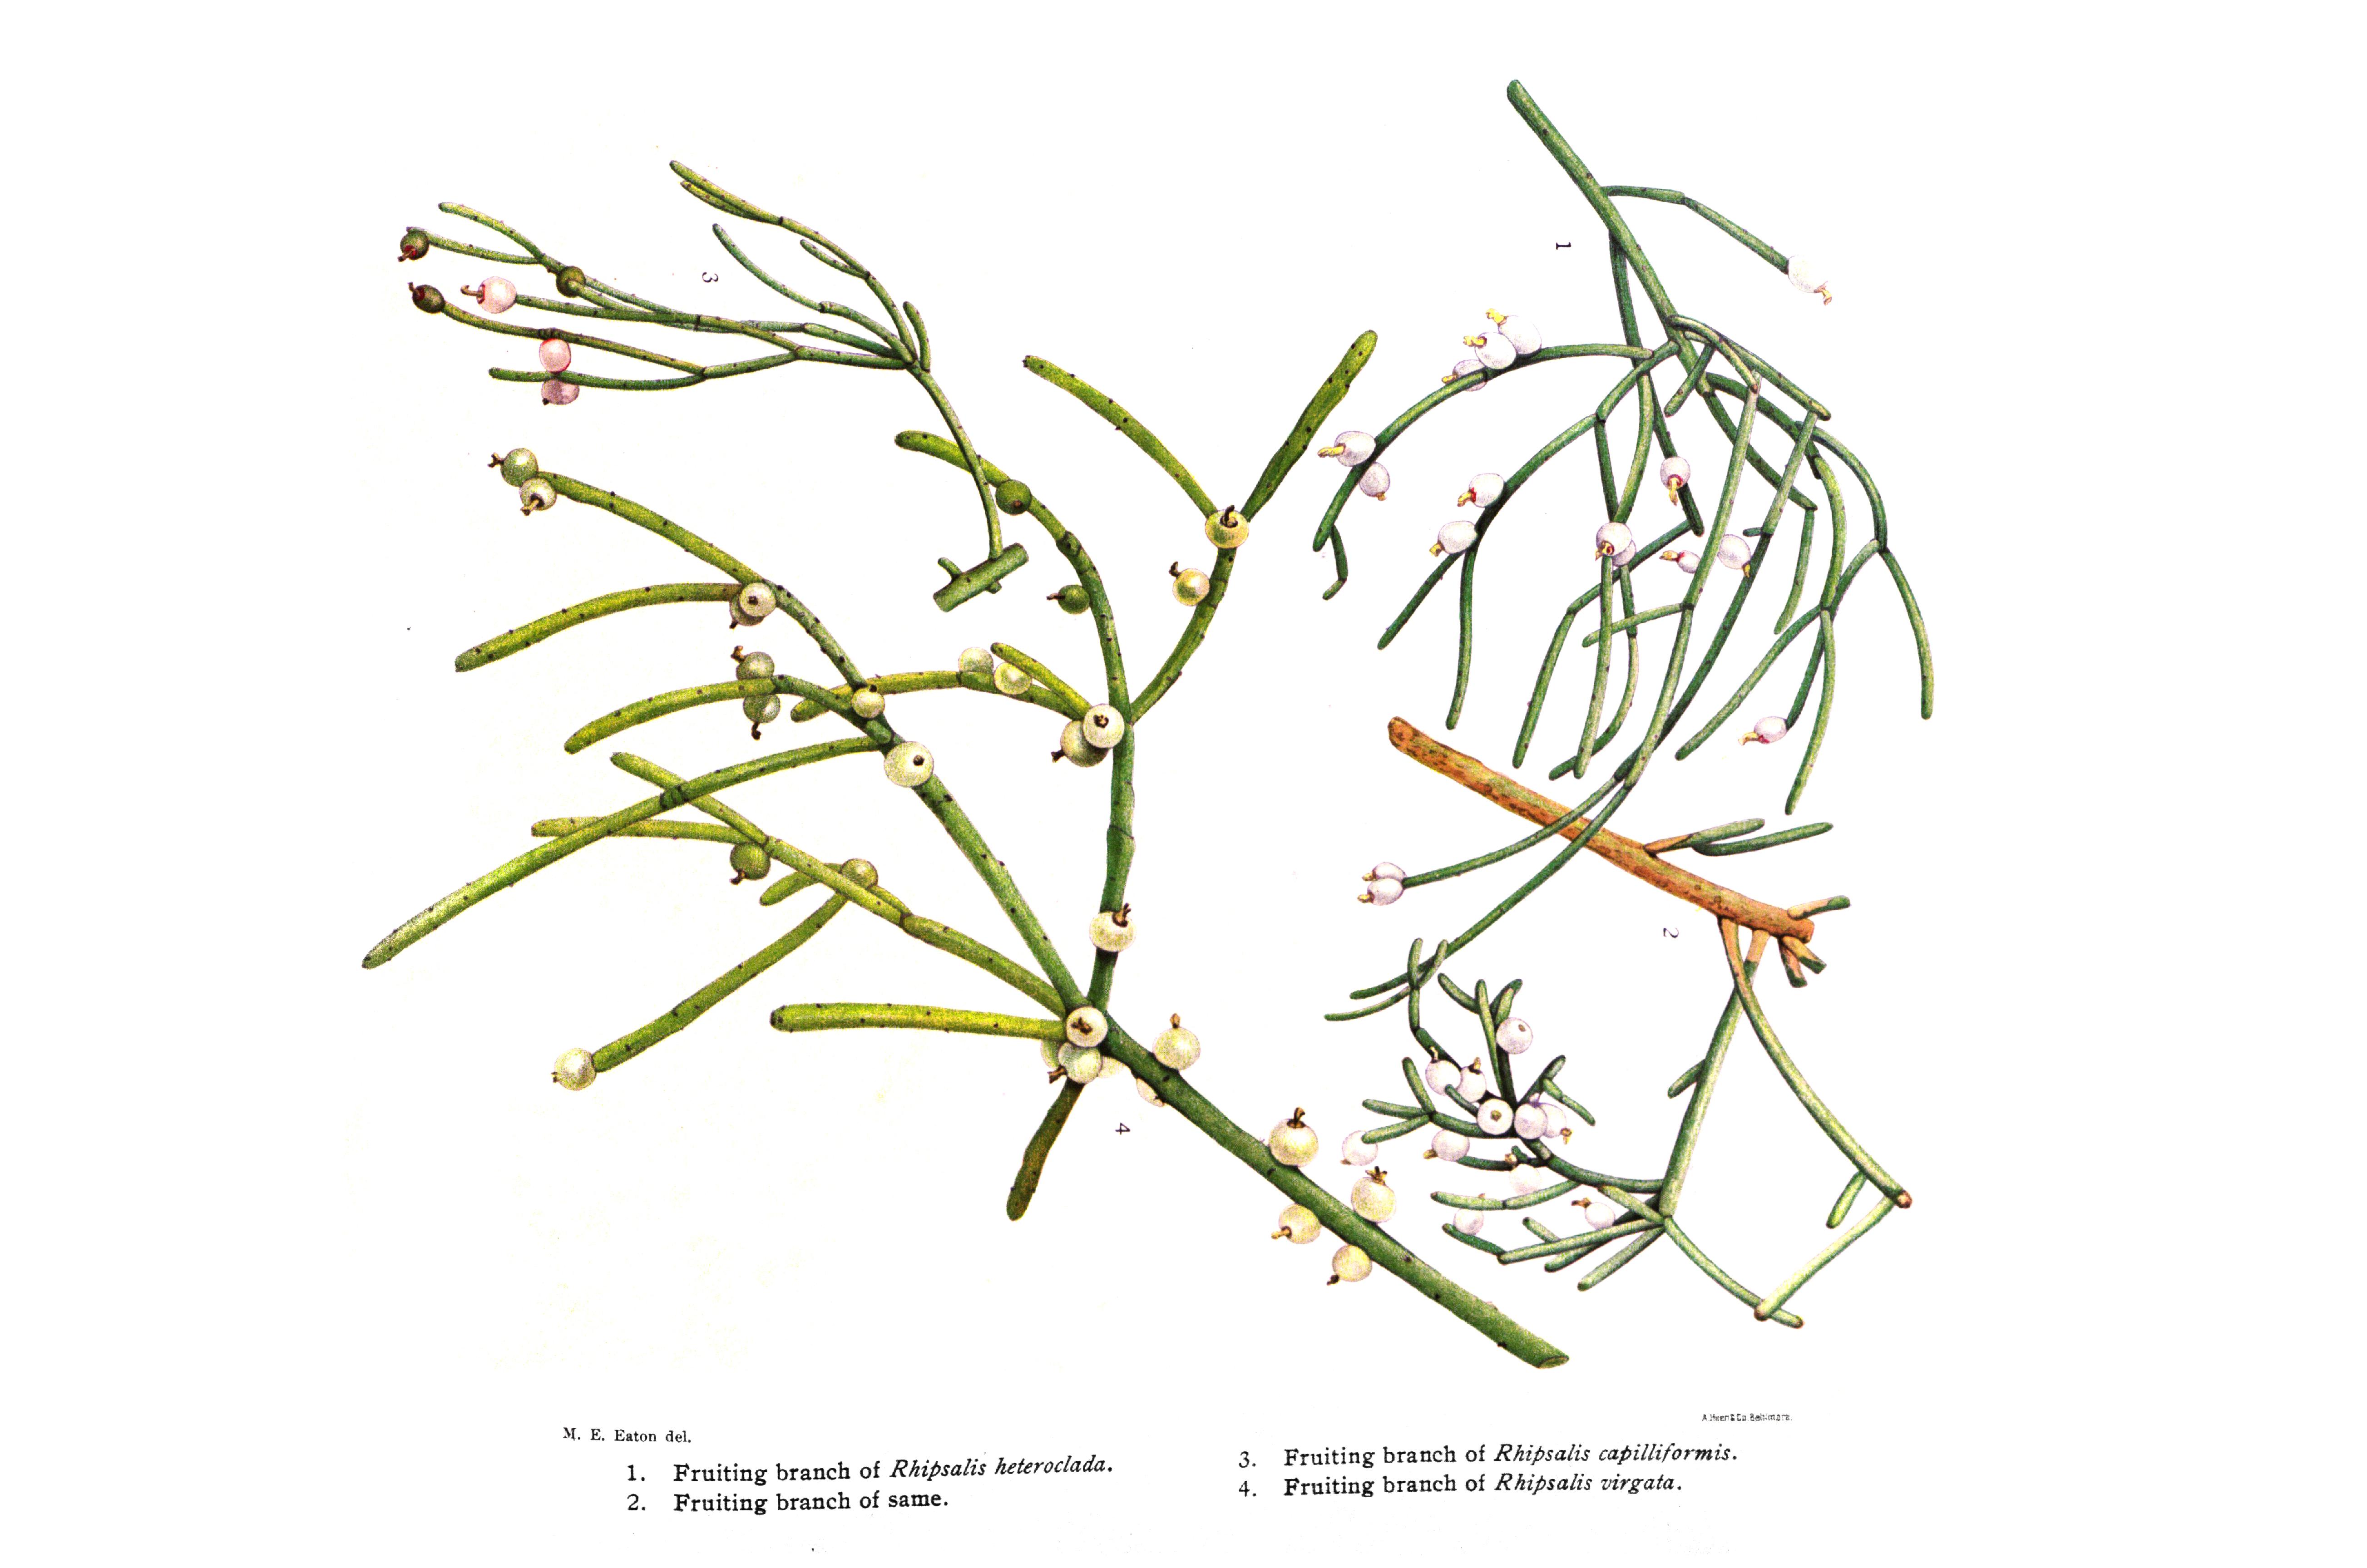 Rhipsalis Paradoxa (Chain Cactus)